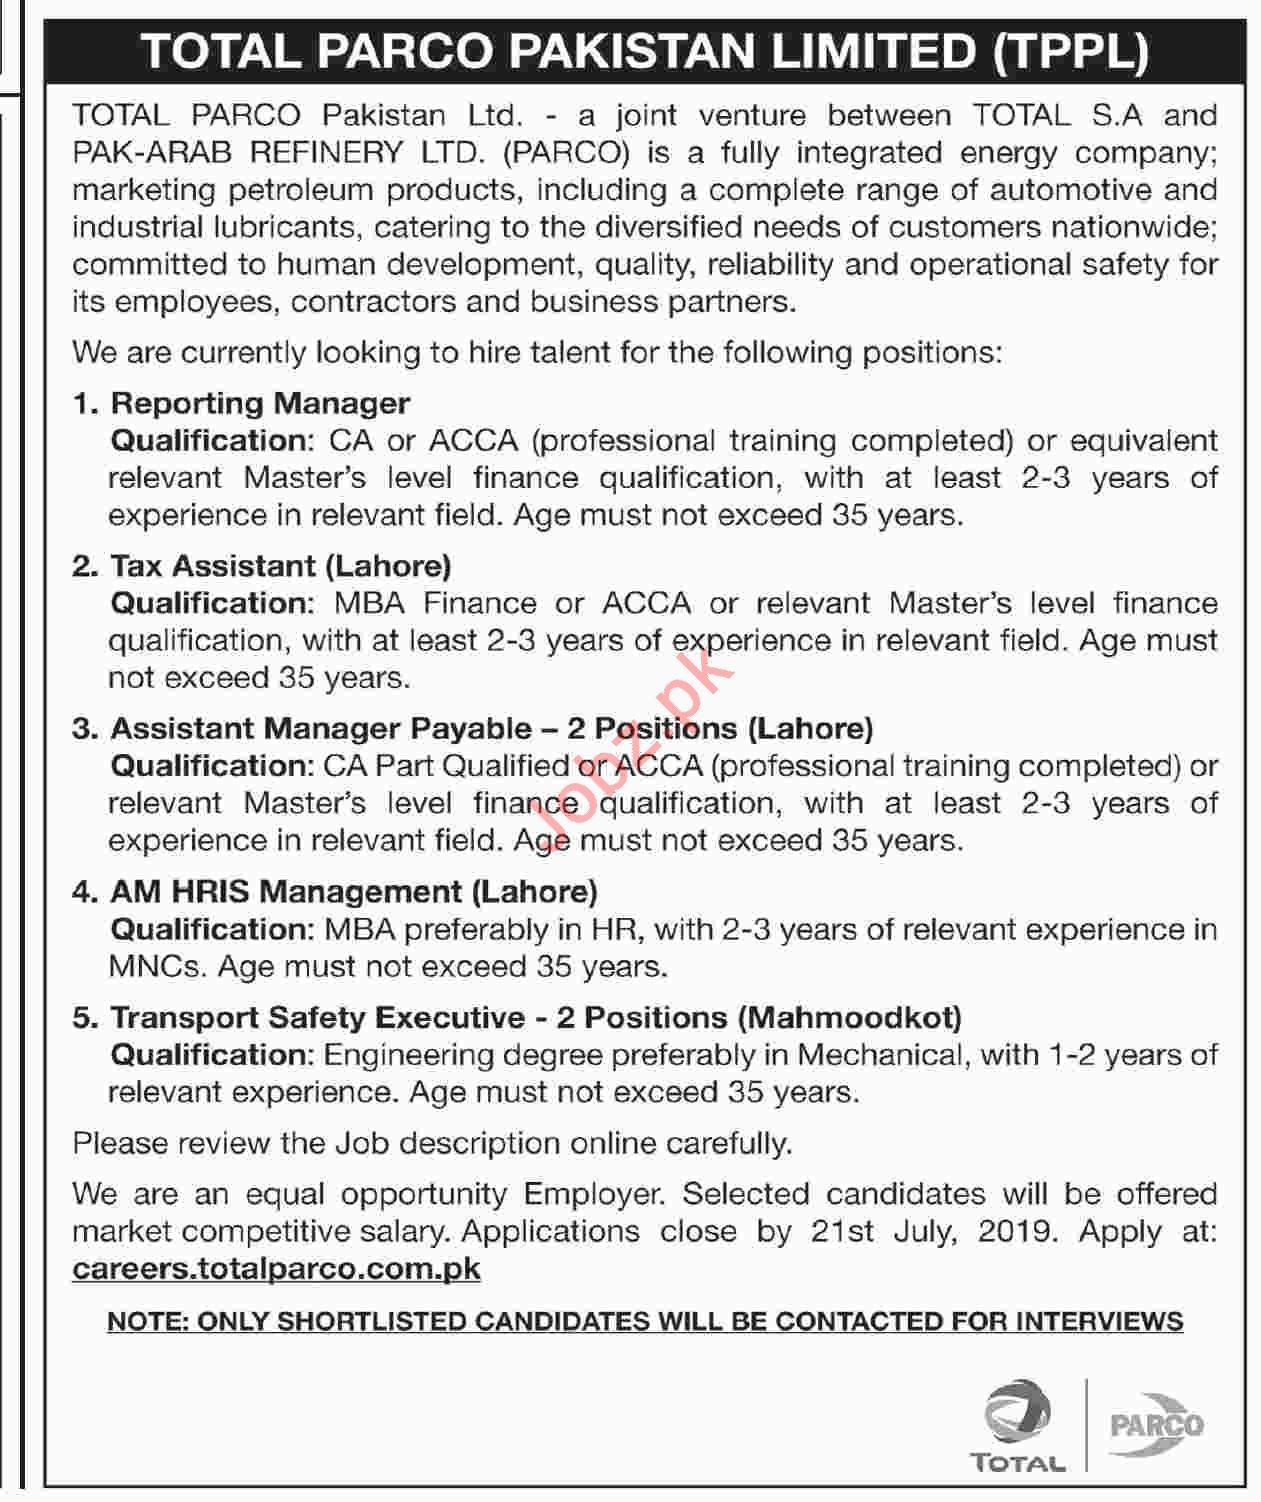 Total PARCO Pakistan Limited TPPL Jobs 2019 For Lahore